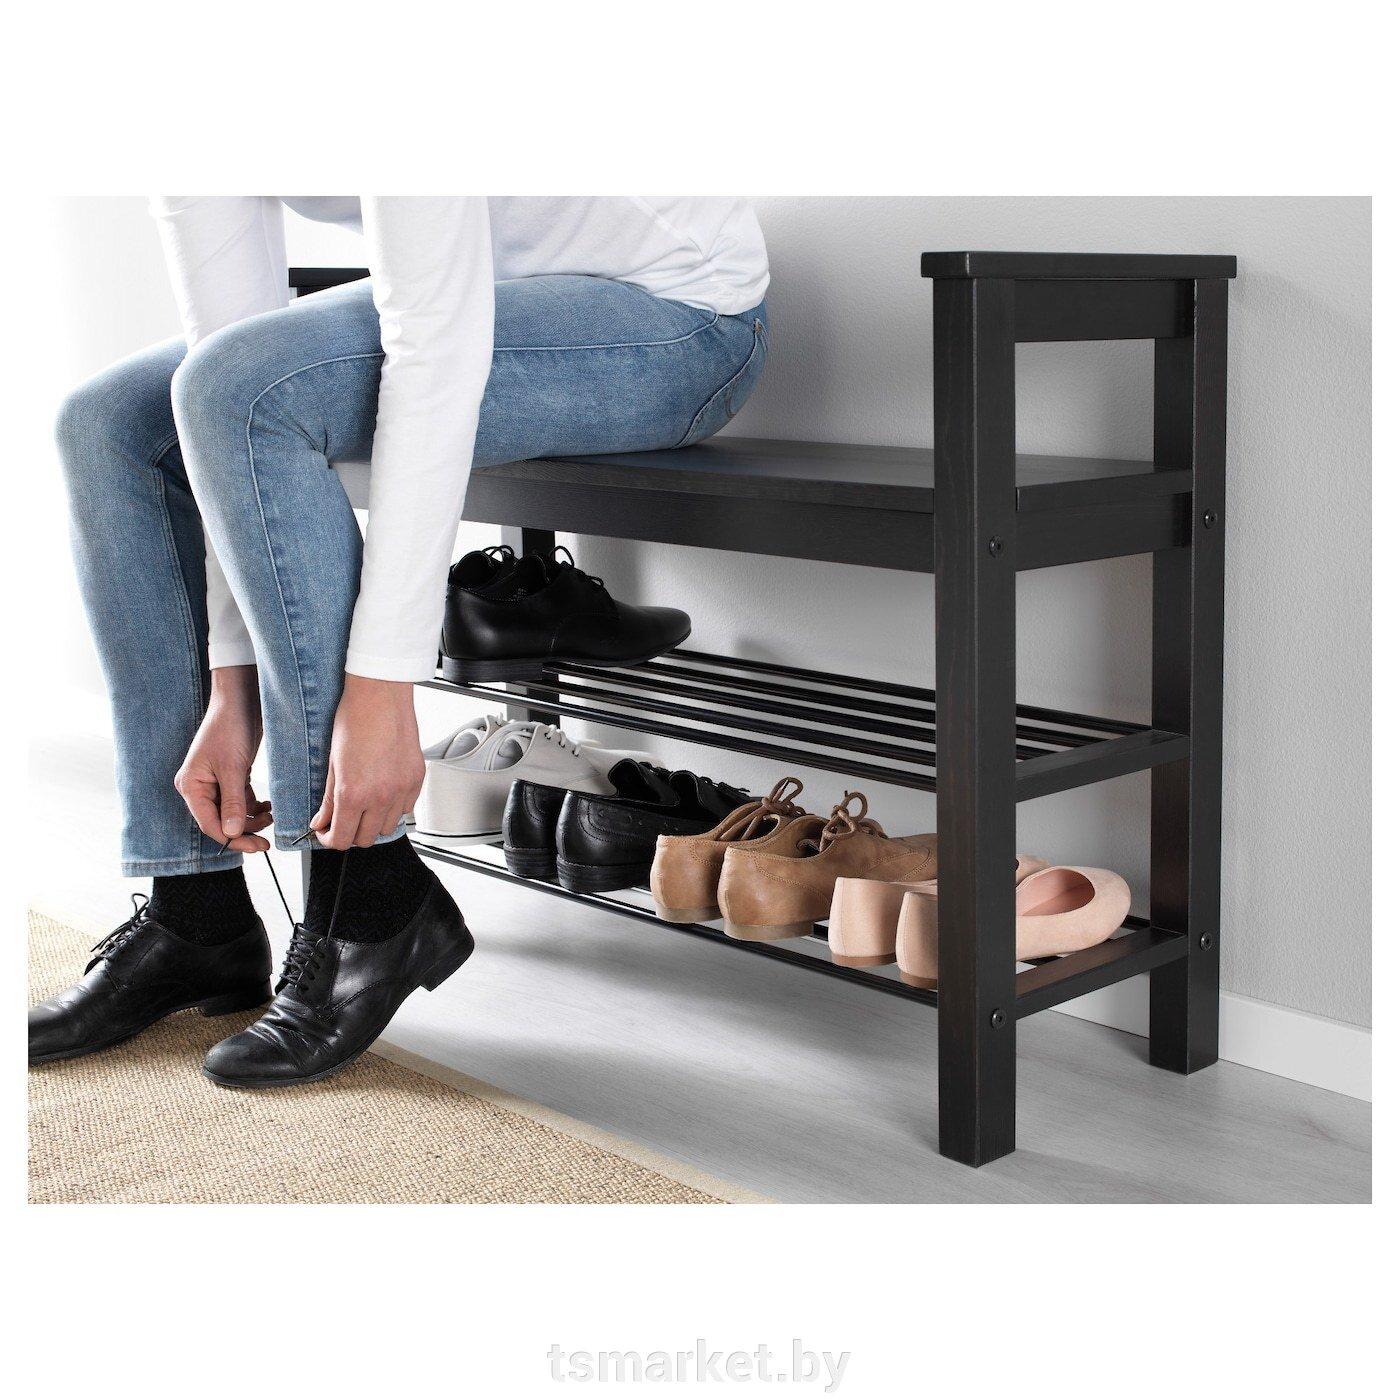 Полки для обуви - фото pic_47fc71b4639d6f413b6e0cd0309feac6_1920x9000_1.jpg